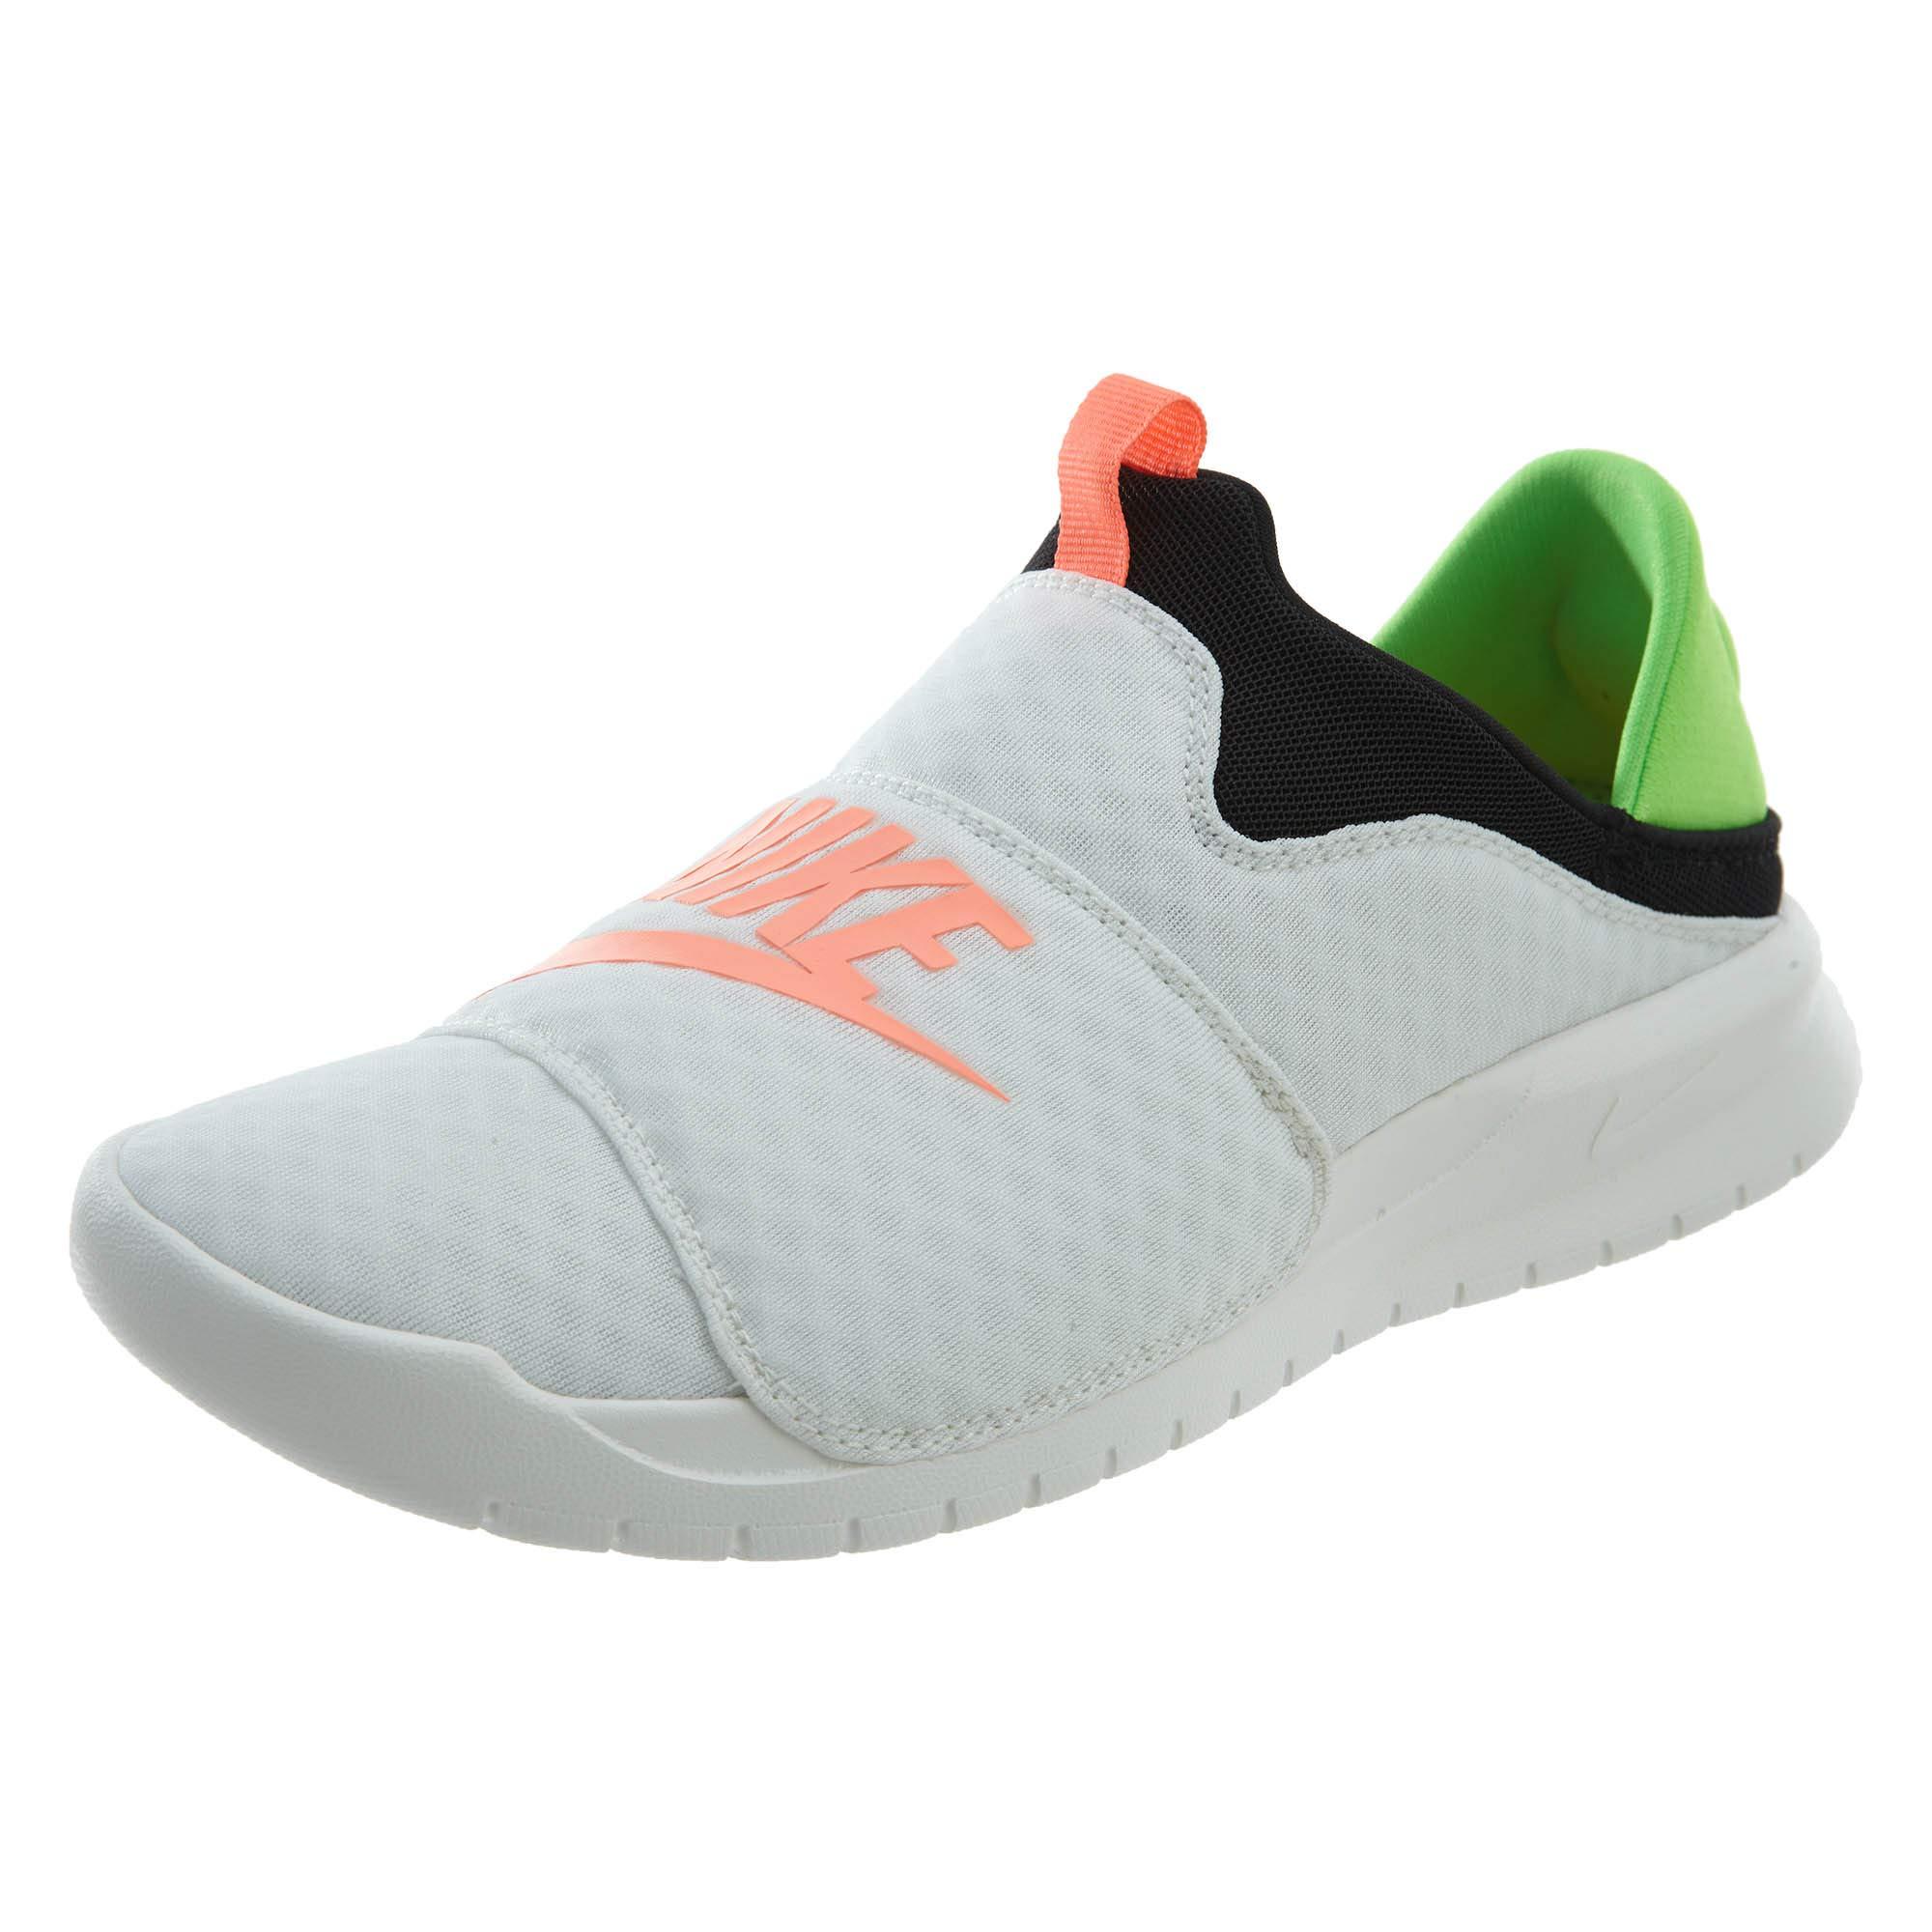 8475eee92 Galleon - Nike Benassi SLP Mens Style  882410-100 Size  11